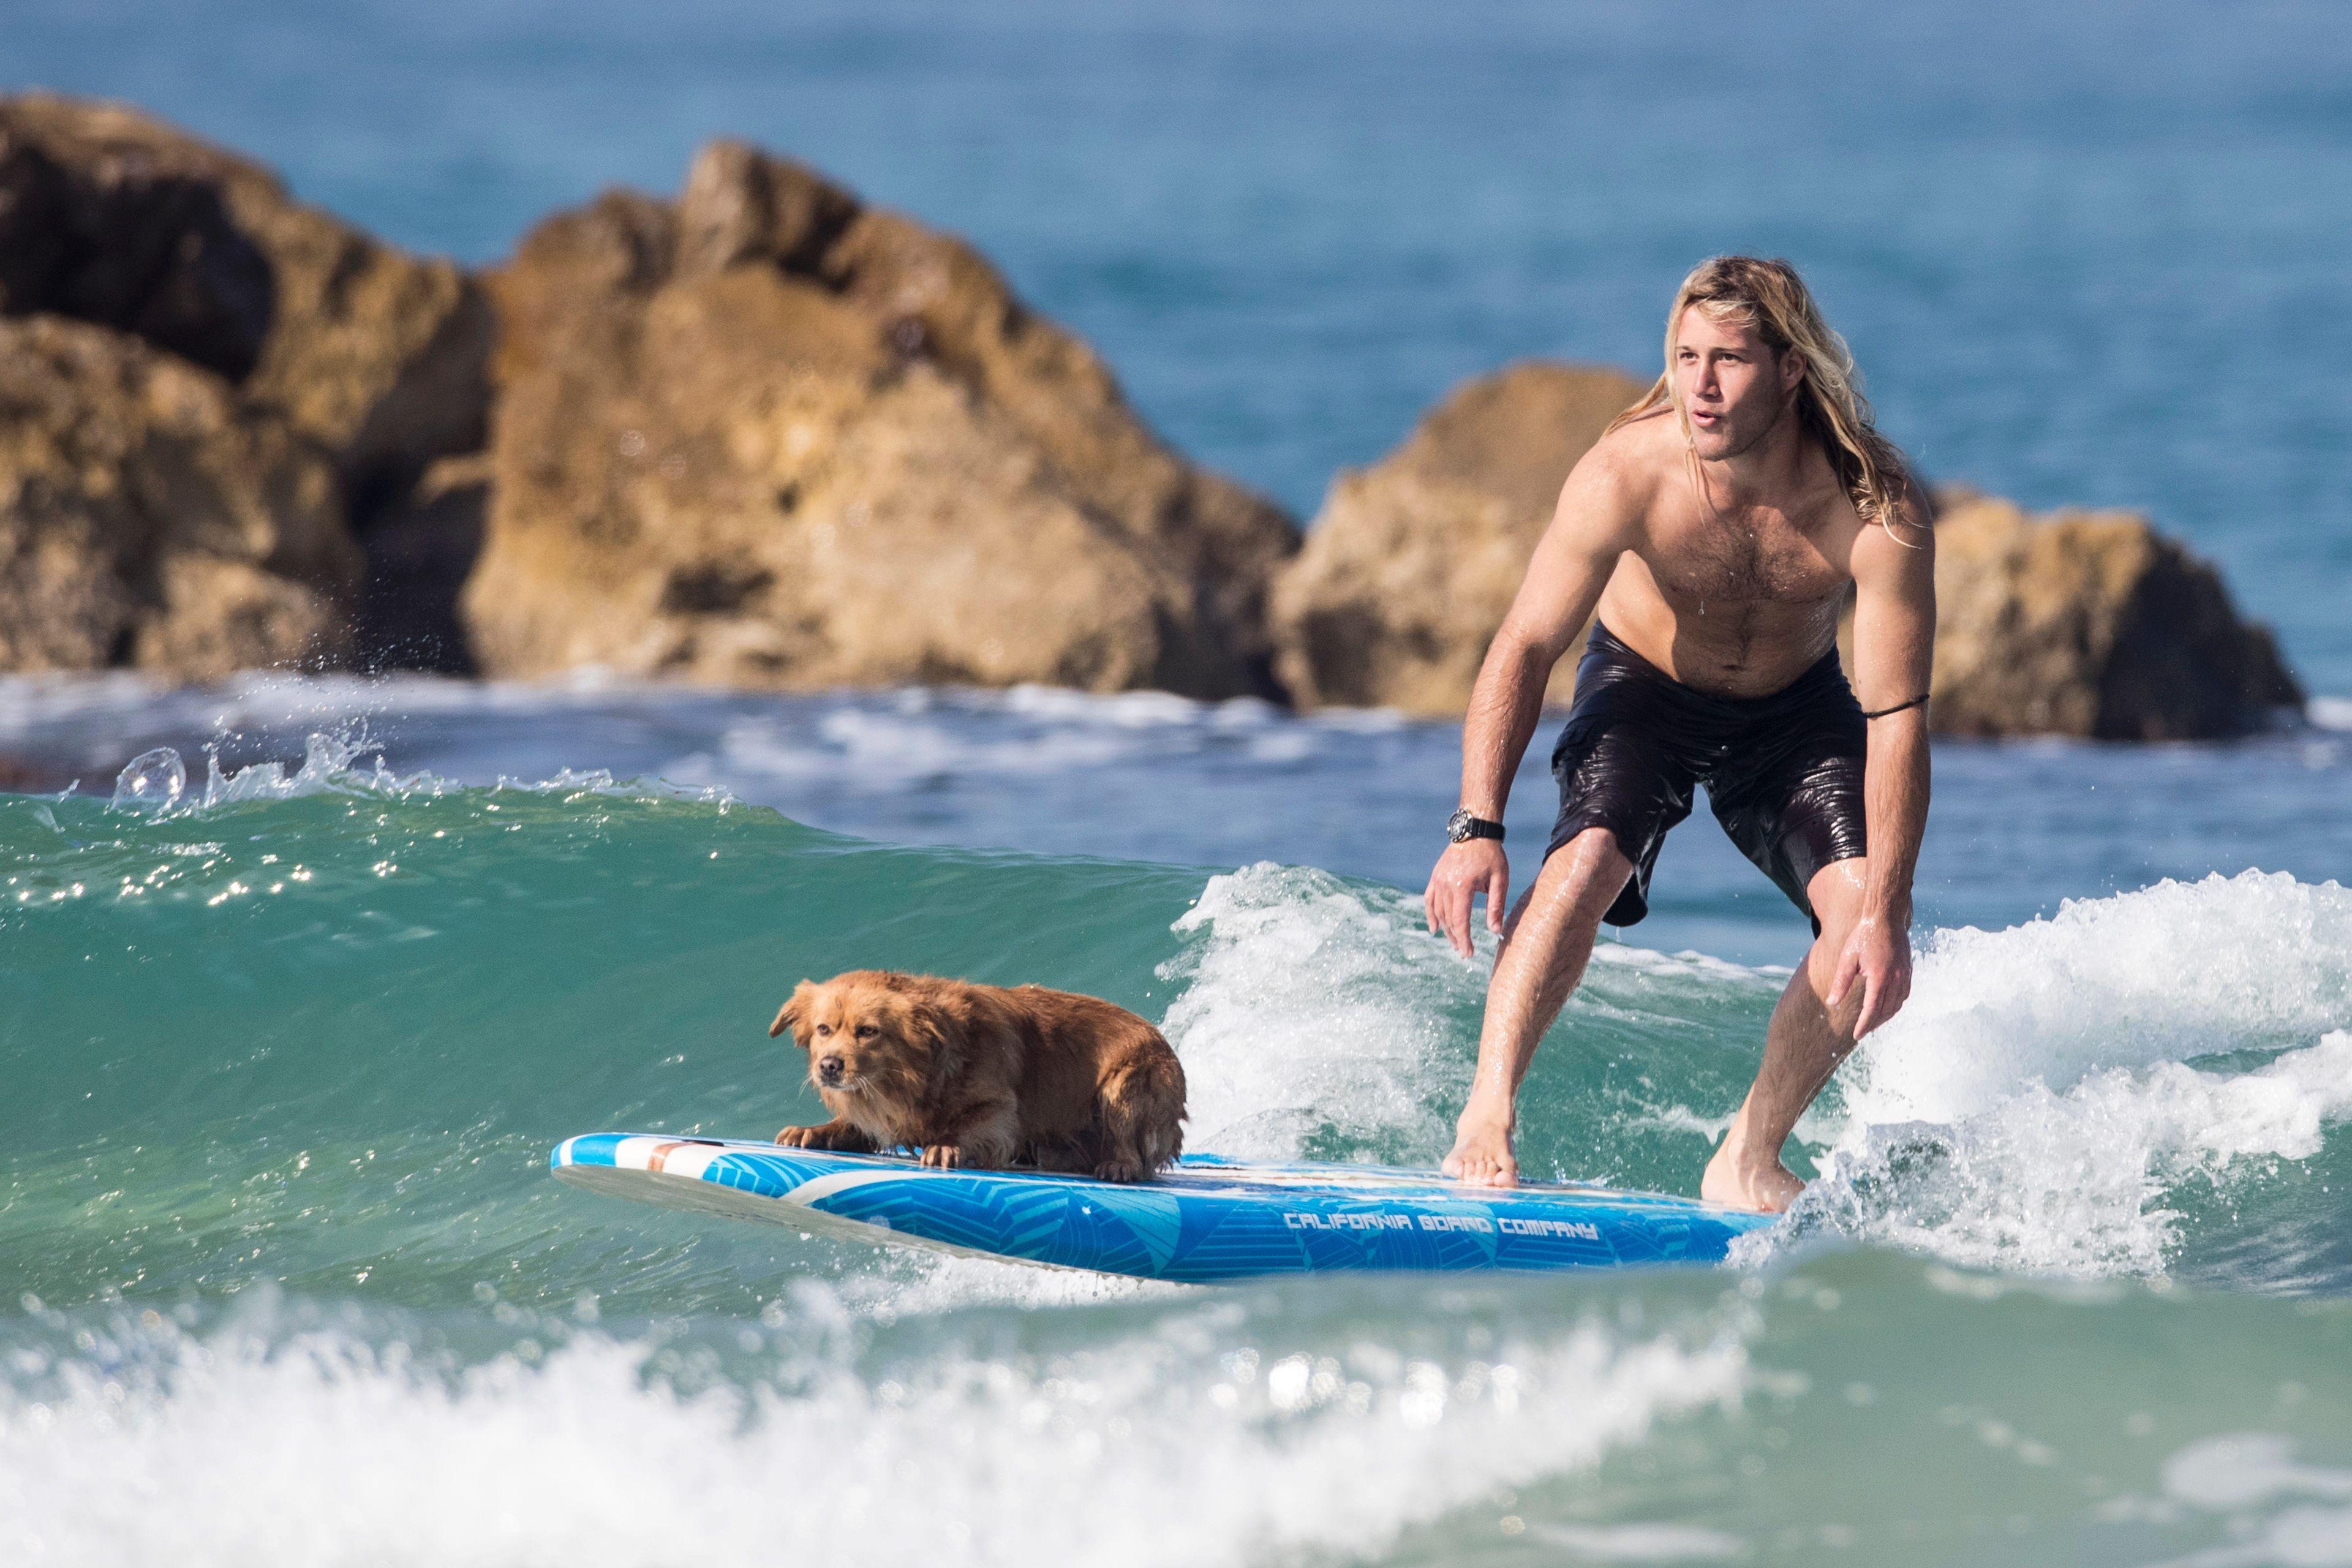 TOPSHOT-SURFING-ISRAEL